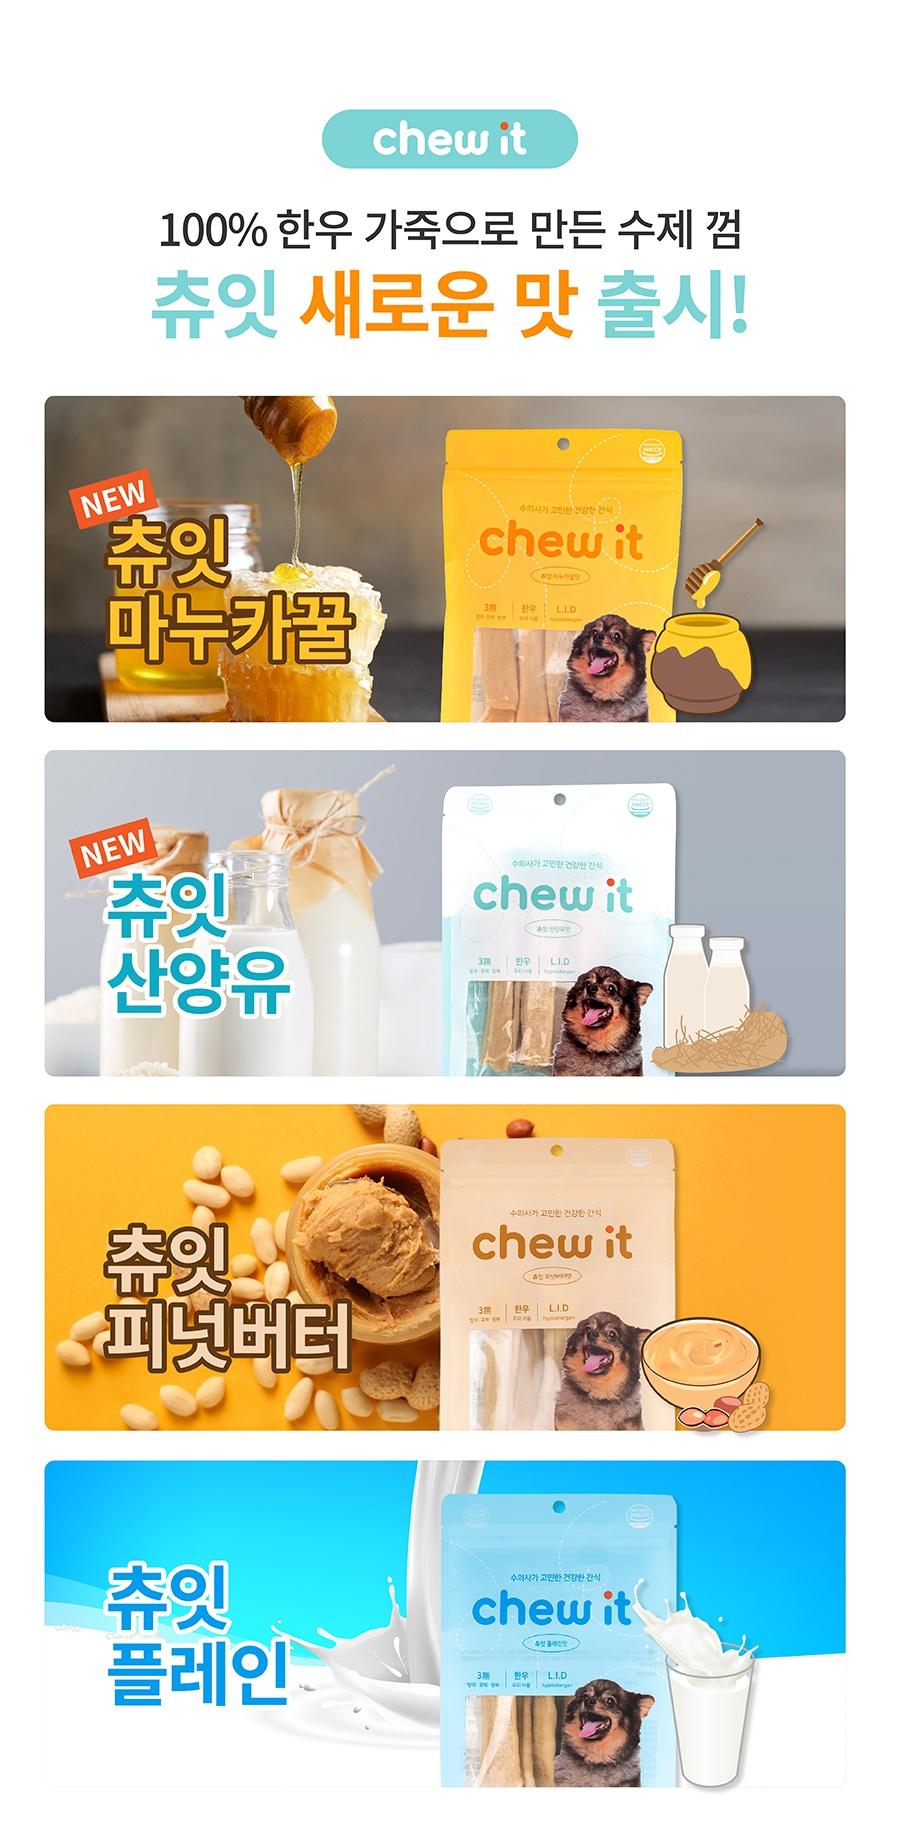 it 츄잇 (플레인/피넛버터/산양유/마누카꿀)-상품이미지-1